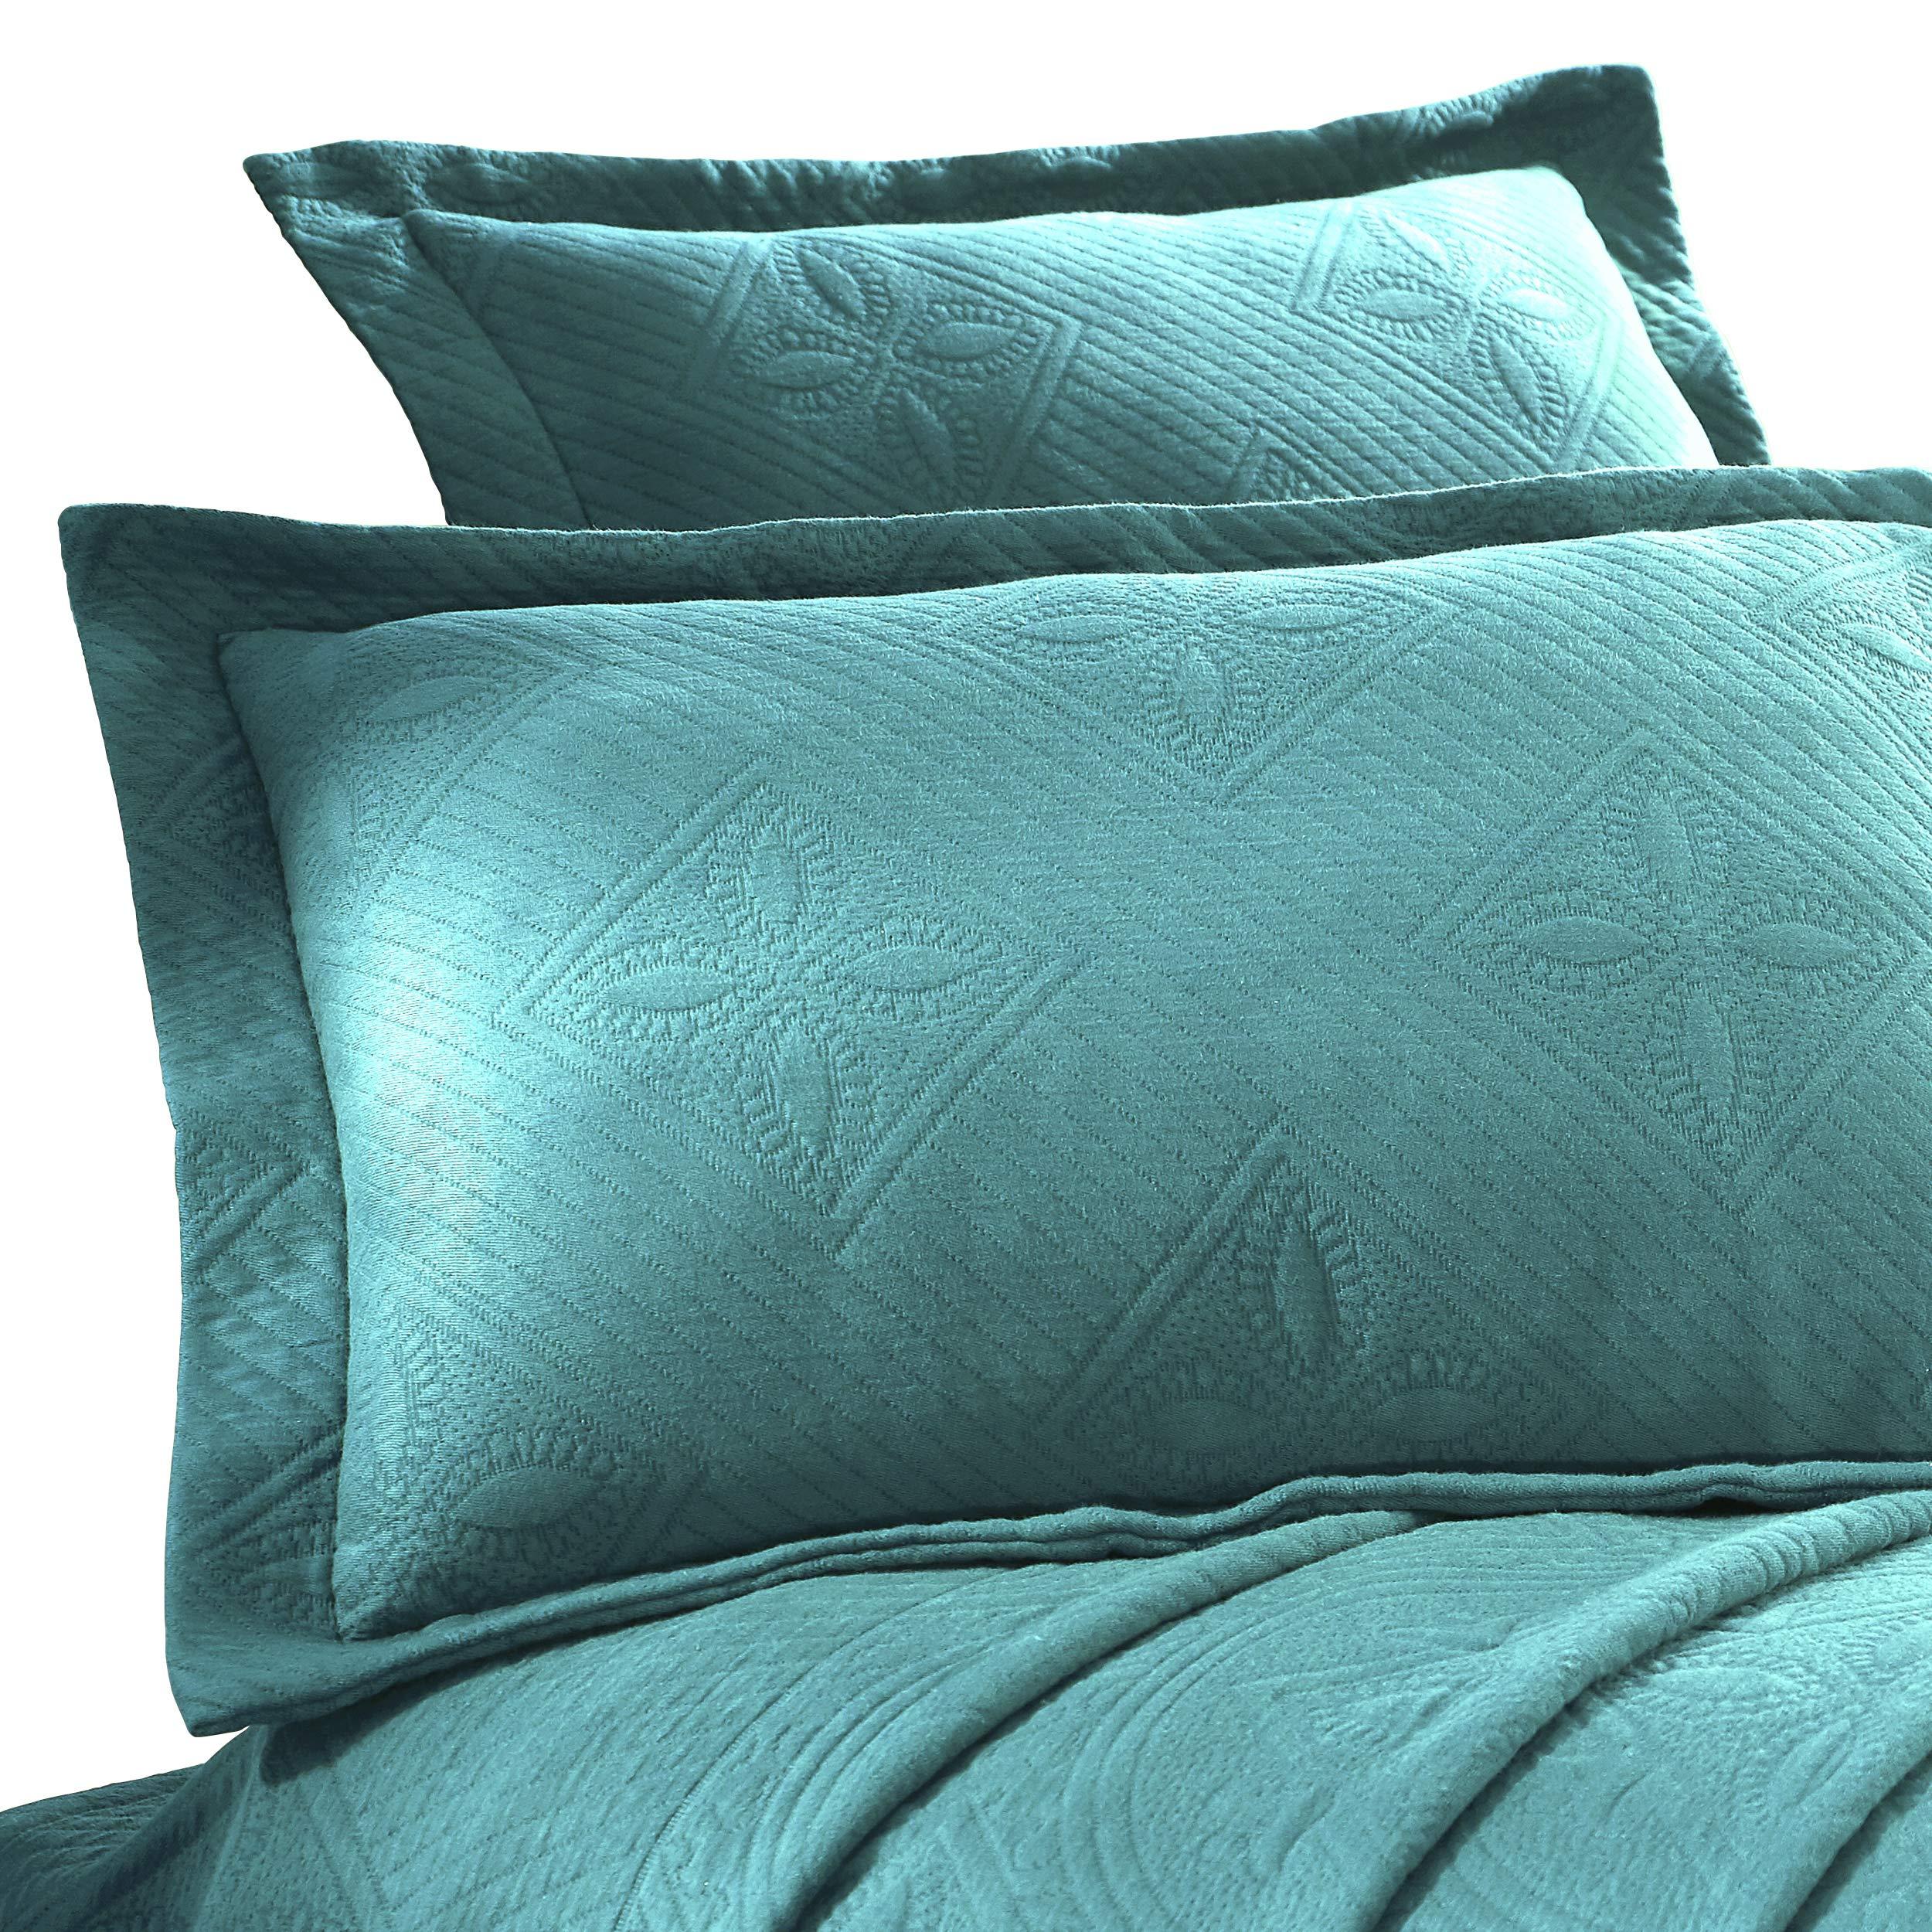 Superior 100% Cotton Celtic Circles 3-Piece Scalloped Bedspread Set, King, Peacock Blue